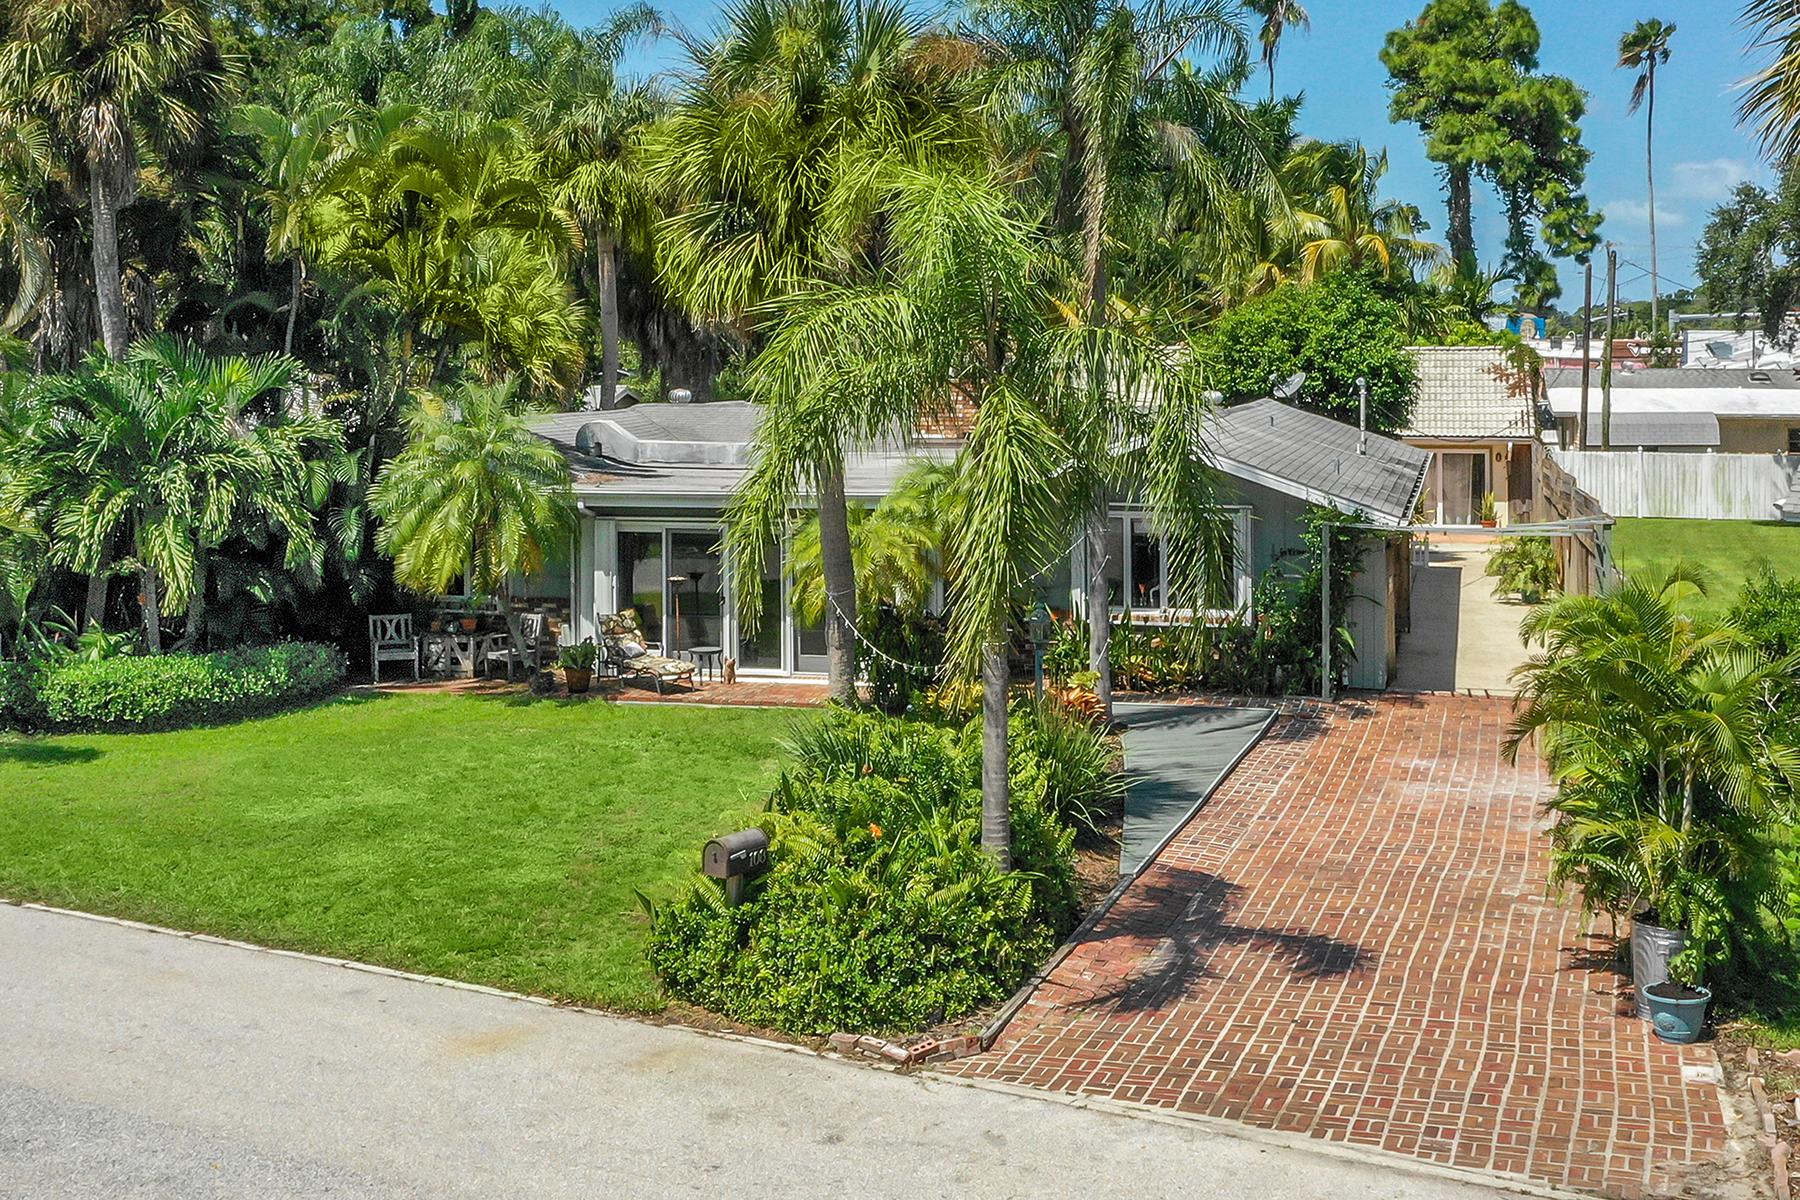 Single Family Homes for Sale at NOKOMIS 108 Sunrise Dr, Nokomis, Florida 34275 United States